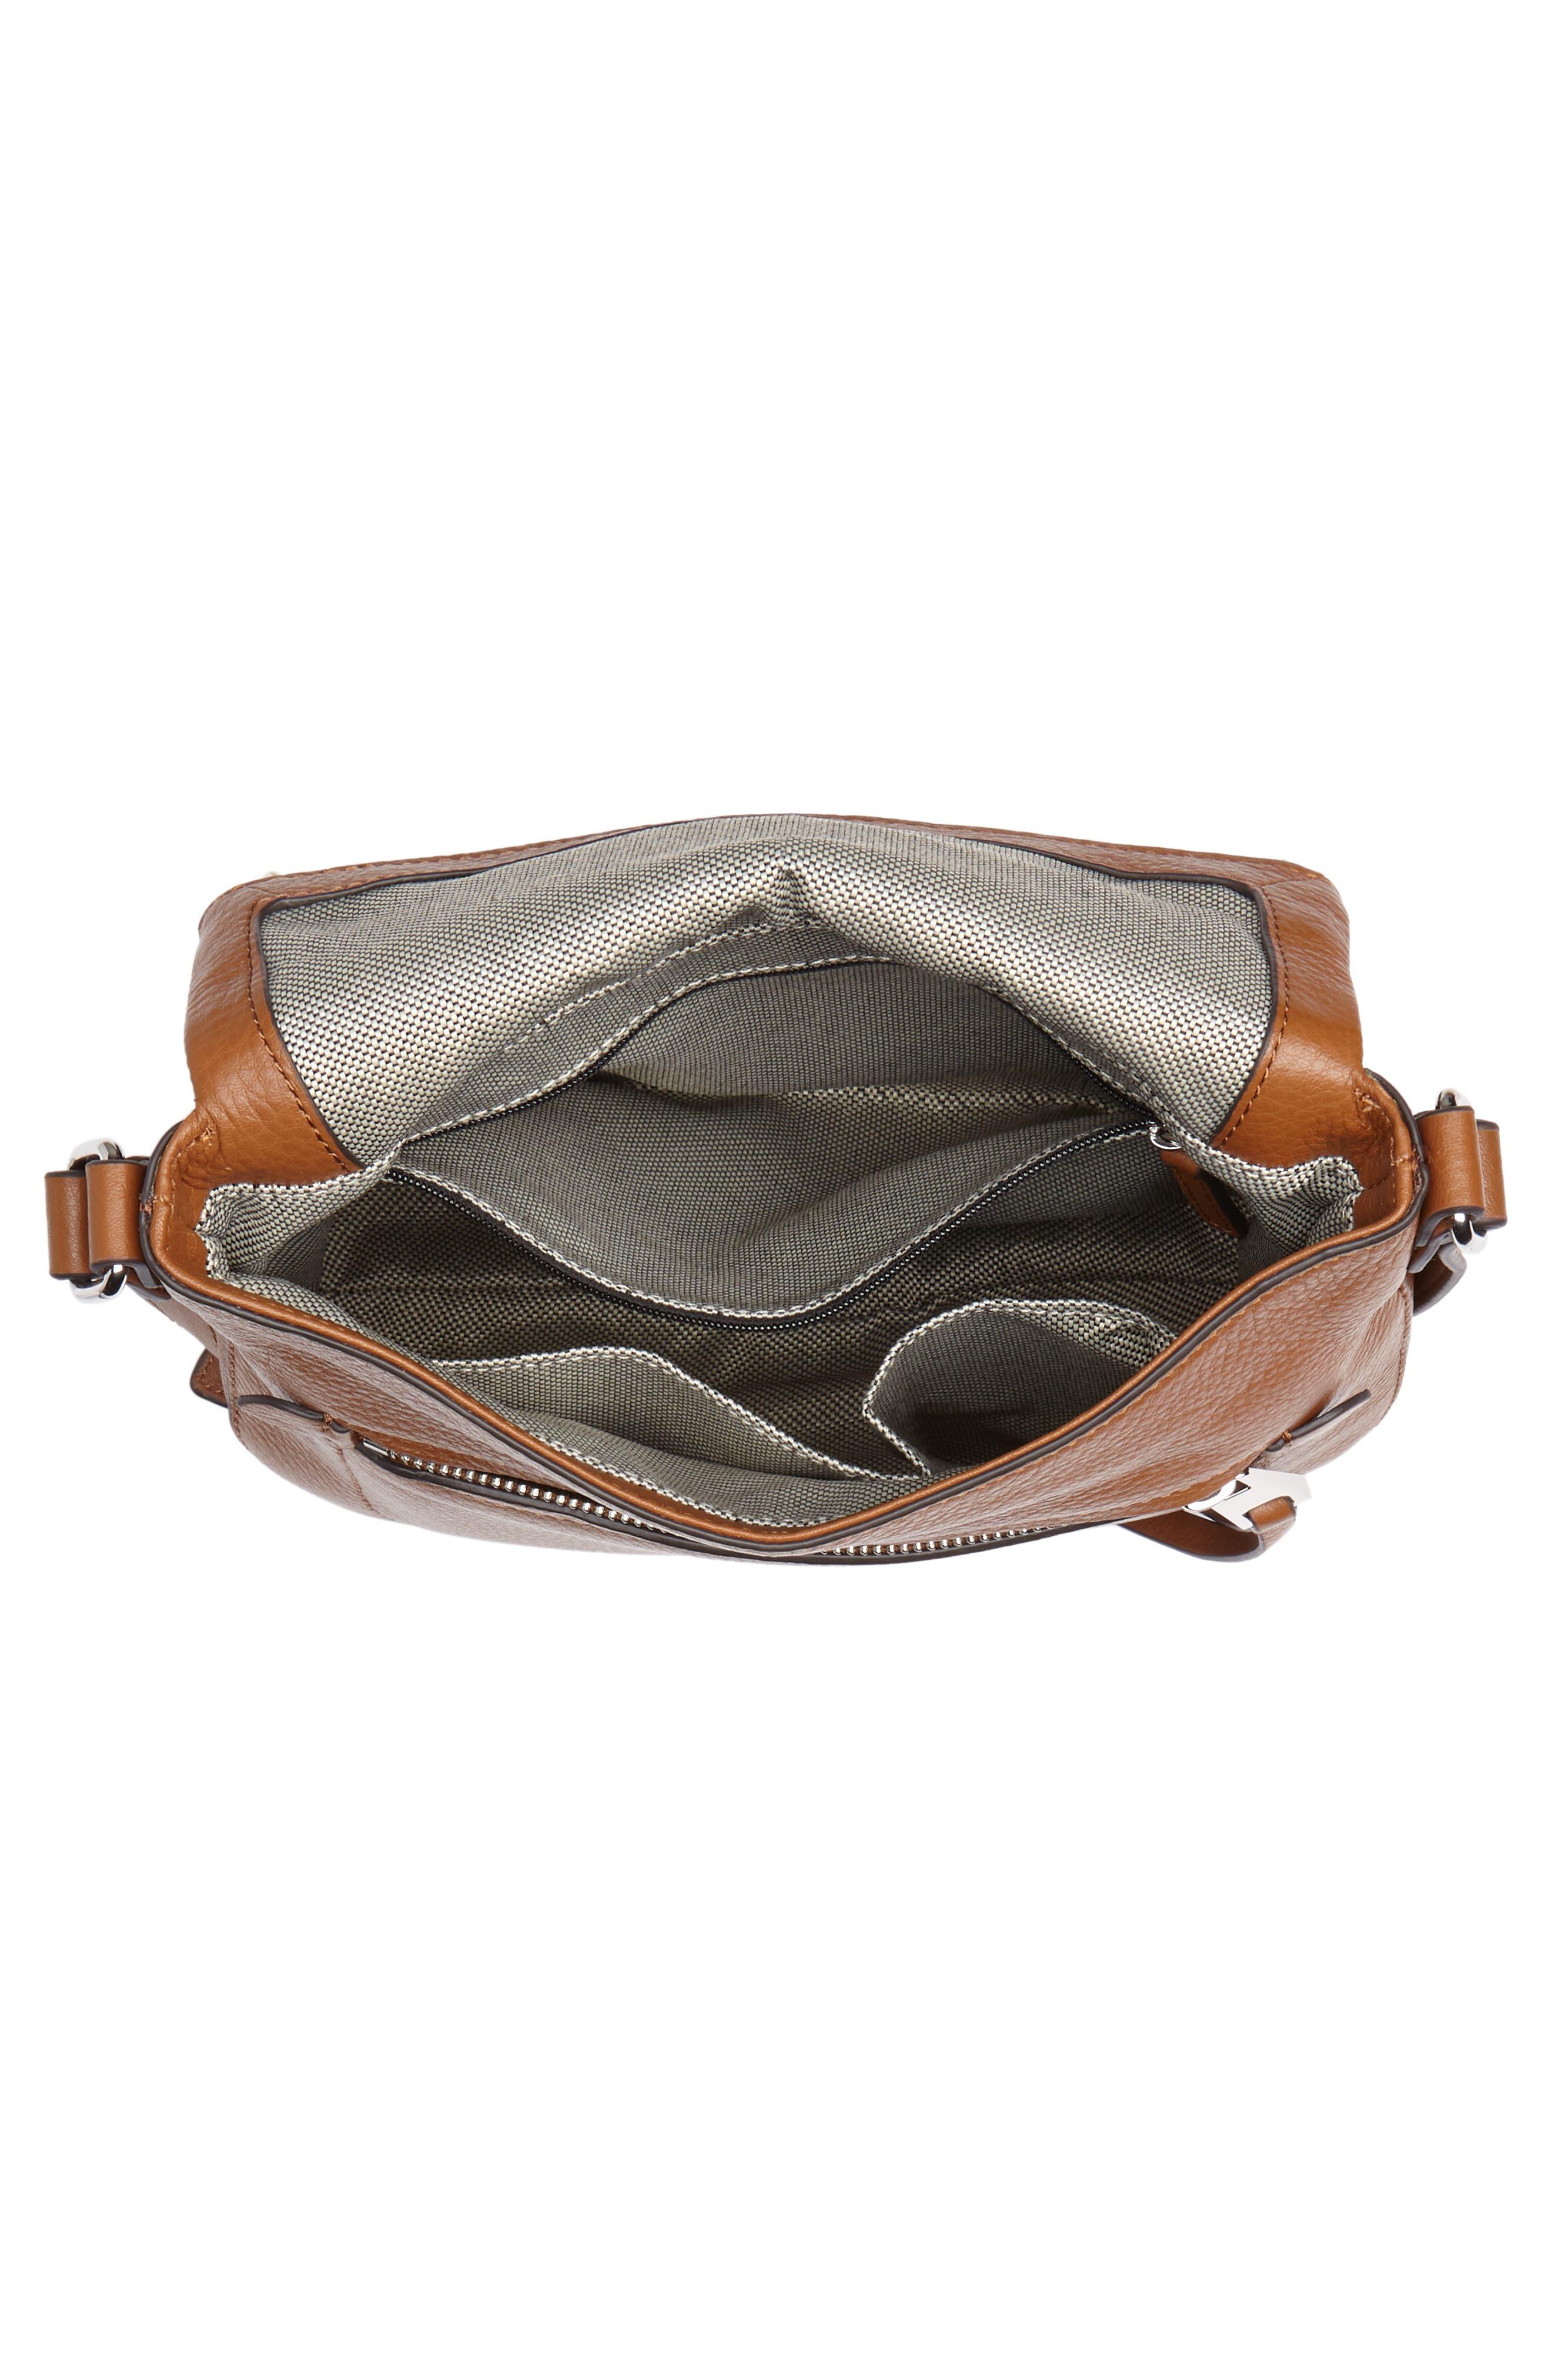 'Tala' Leather Crossbody Bag,                             Alternate thumbnail 4, color,                             203